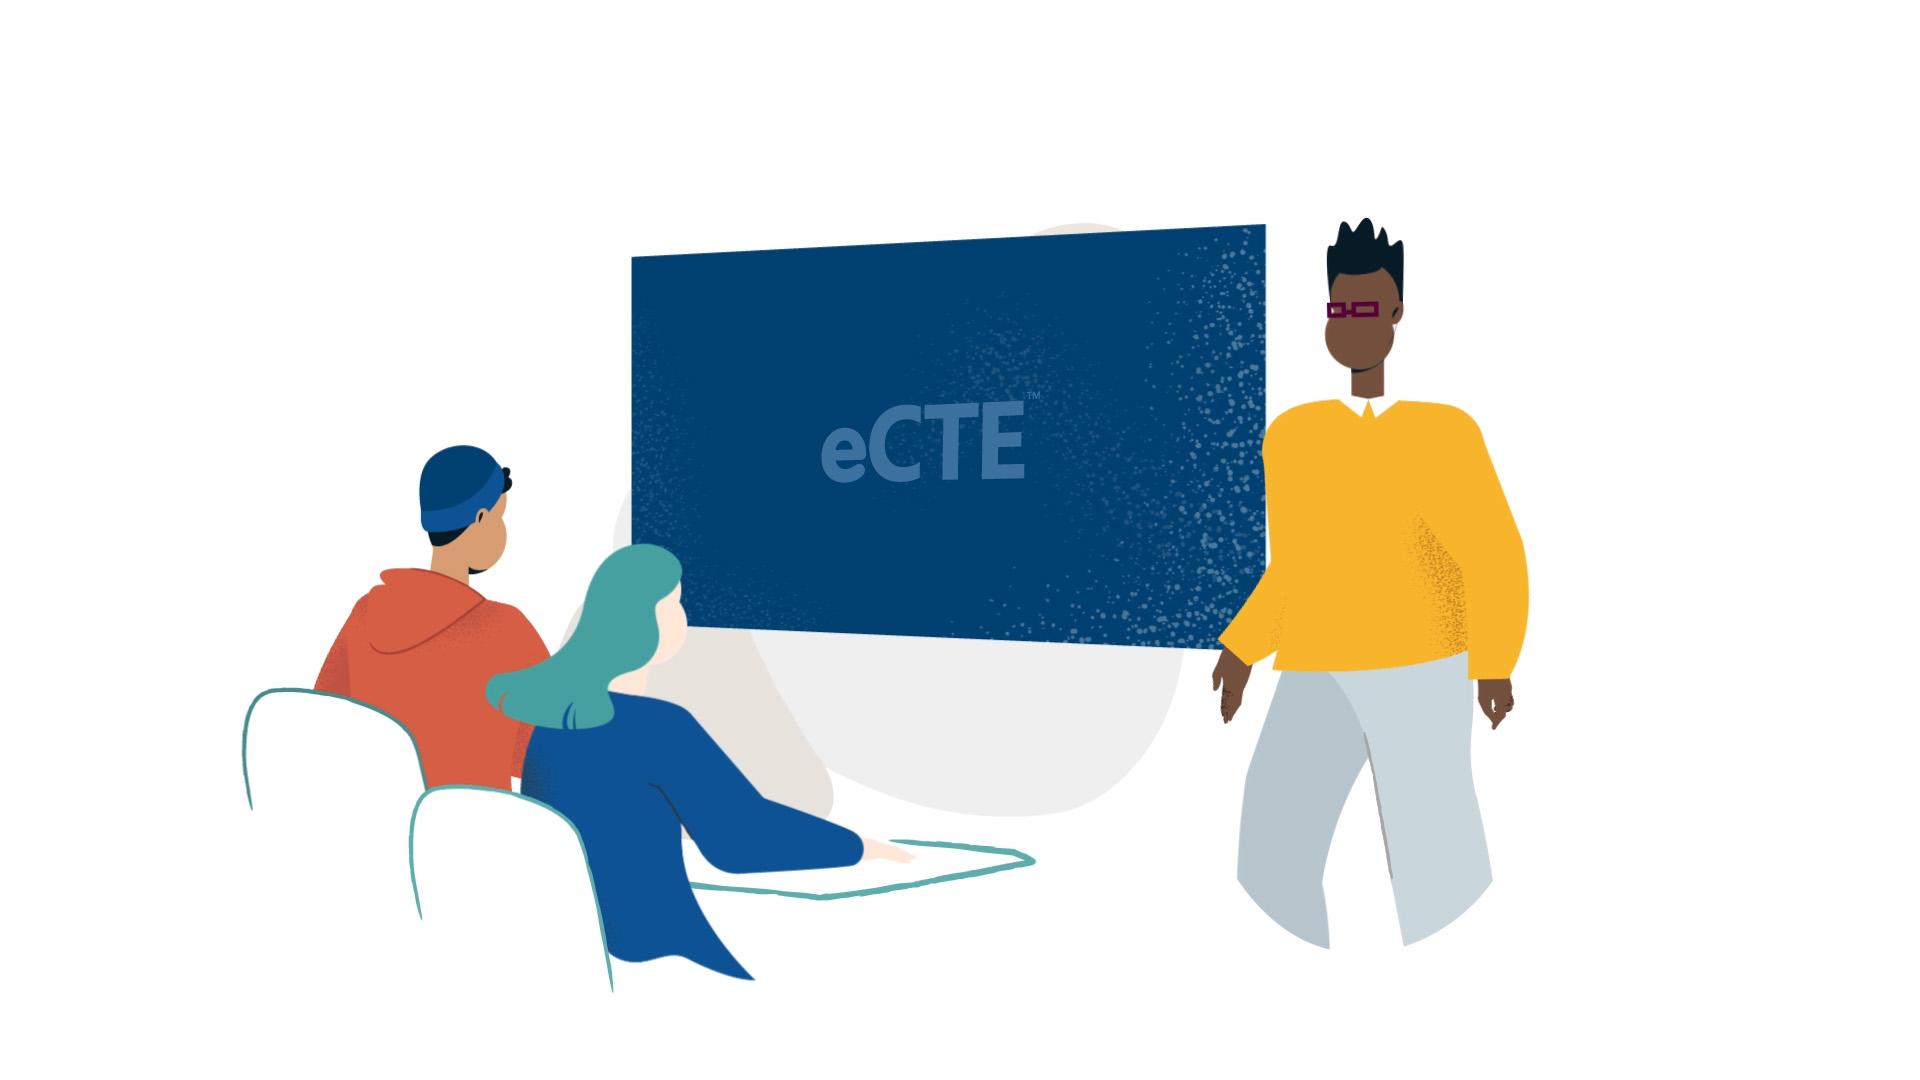 Ecte revealing